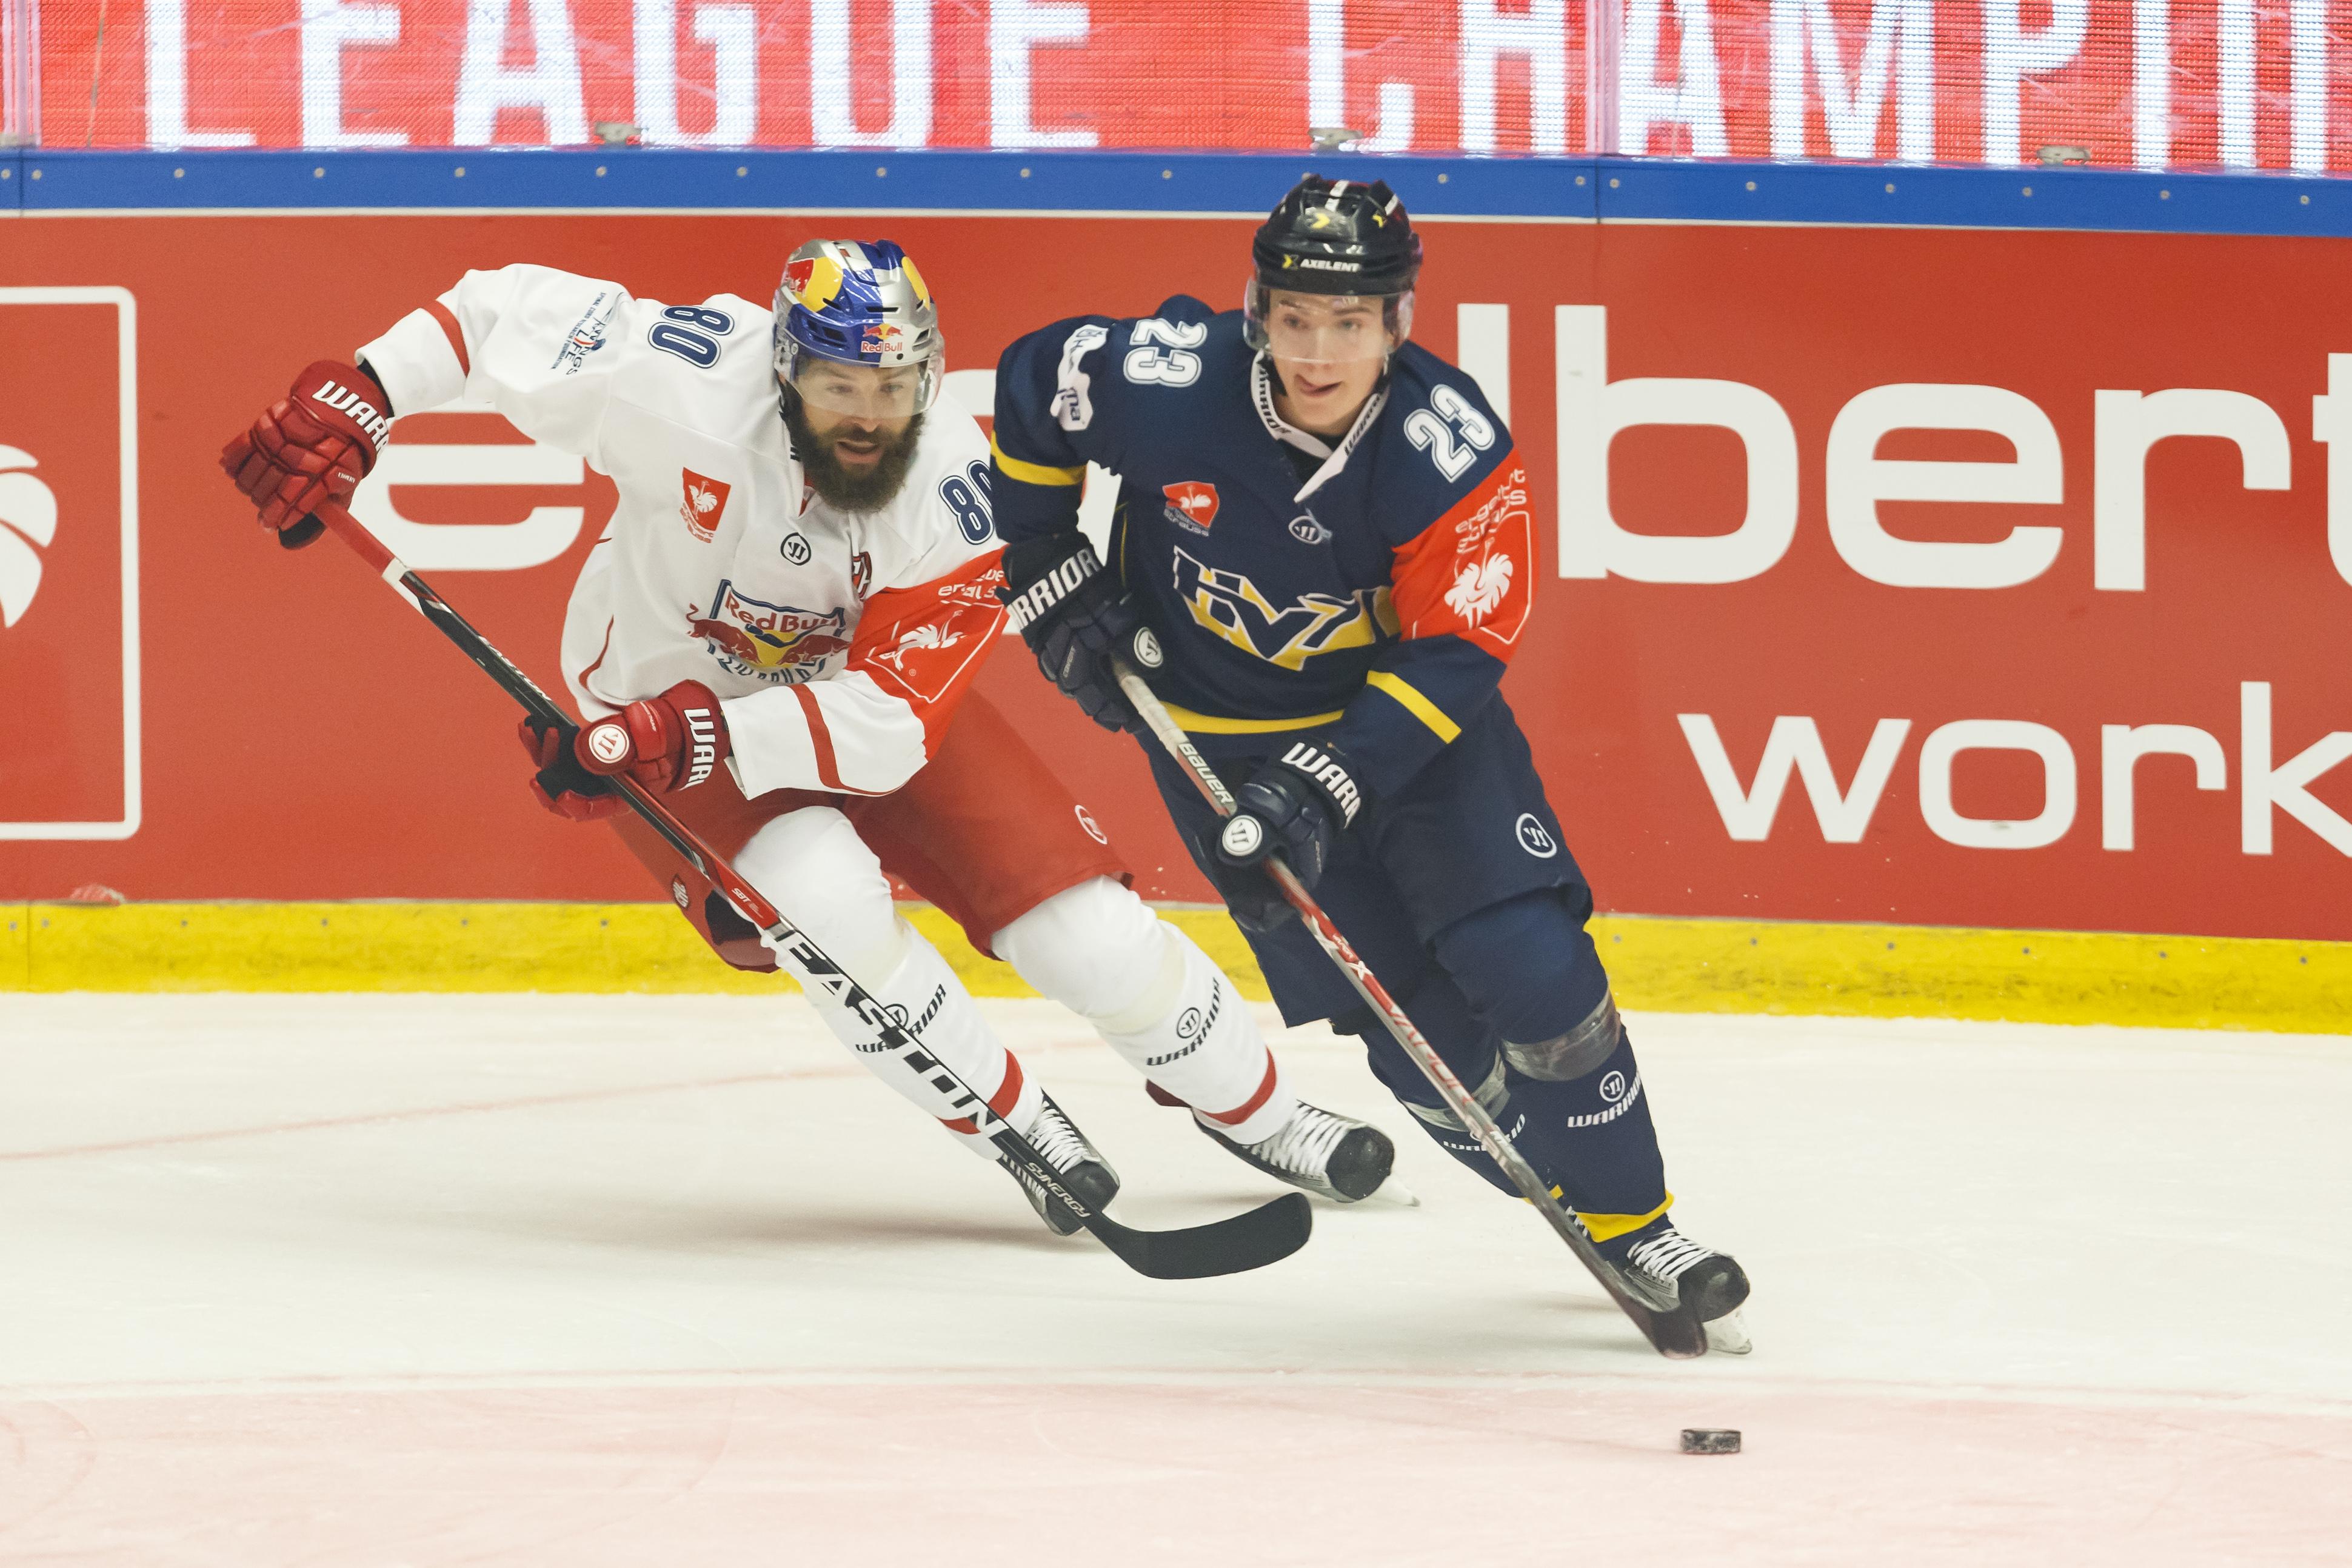 HV71 Jonkoping v Red Bull Salzburg - Champions Hockey League